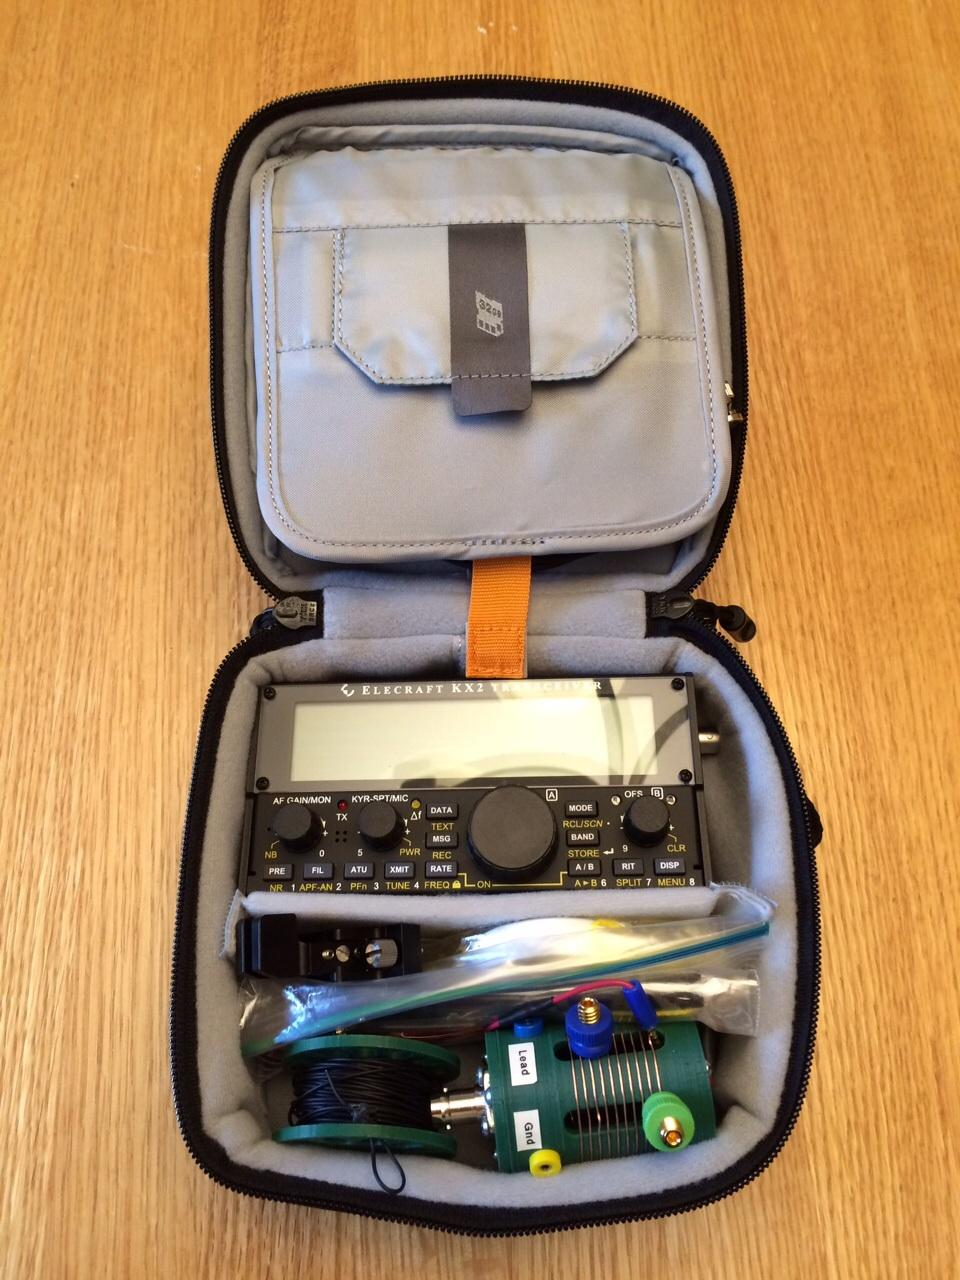 Elecraft to release KX2 at Dayton 4DIM - Radios & Power